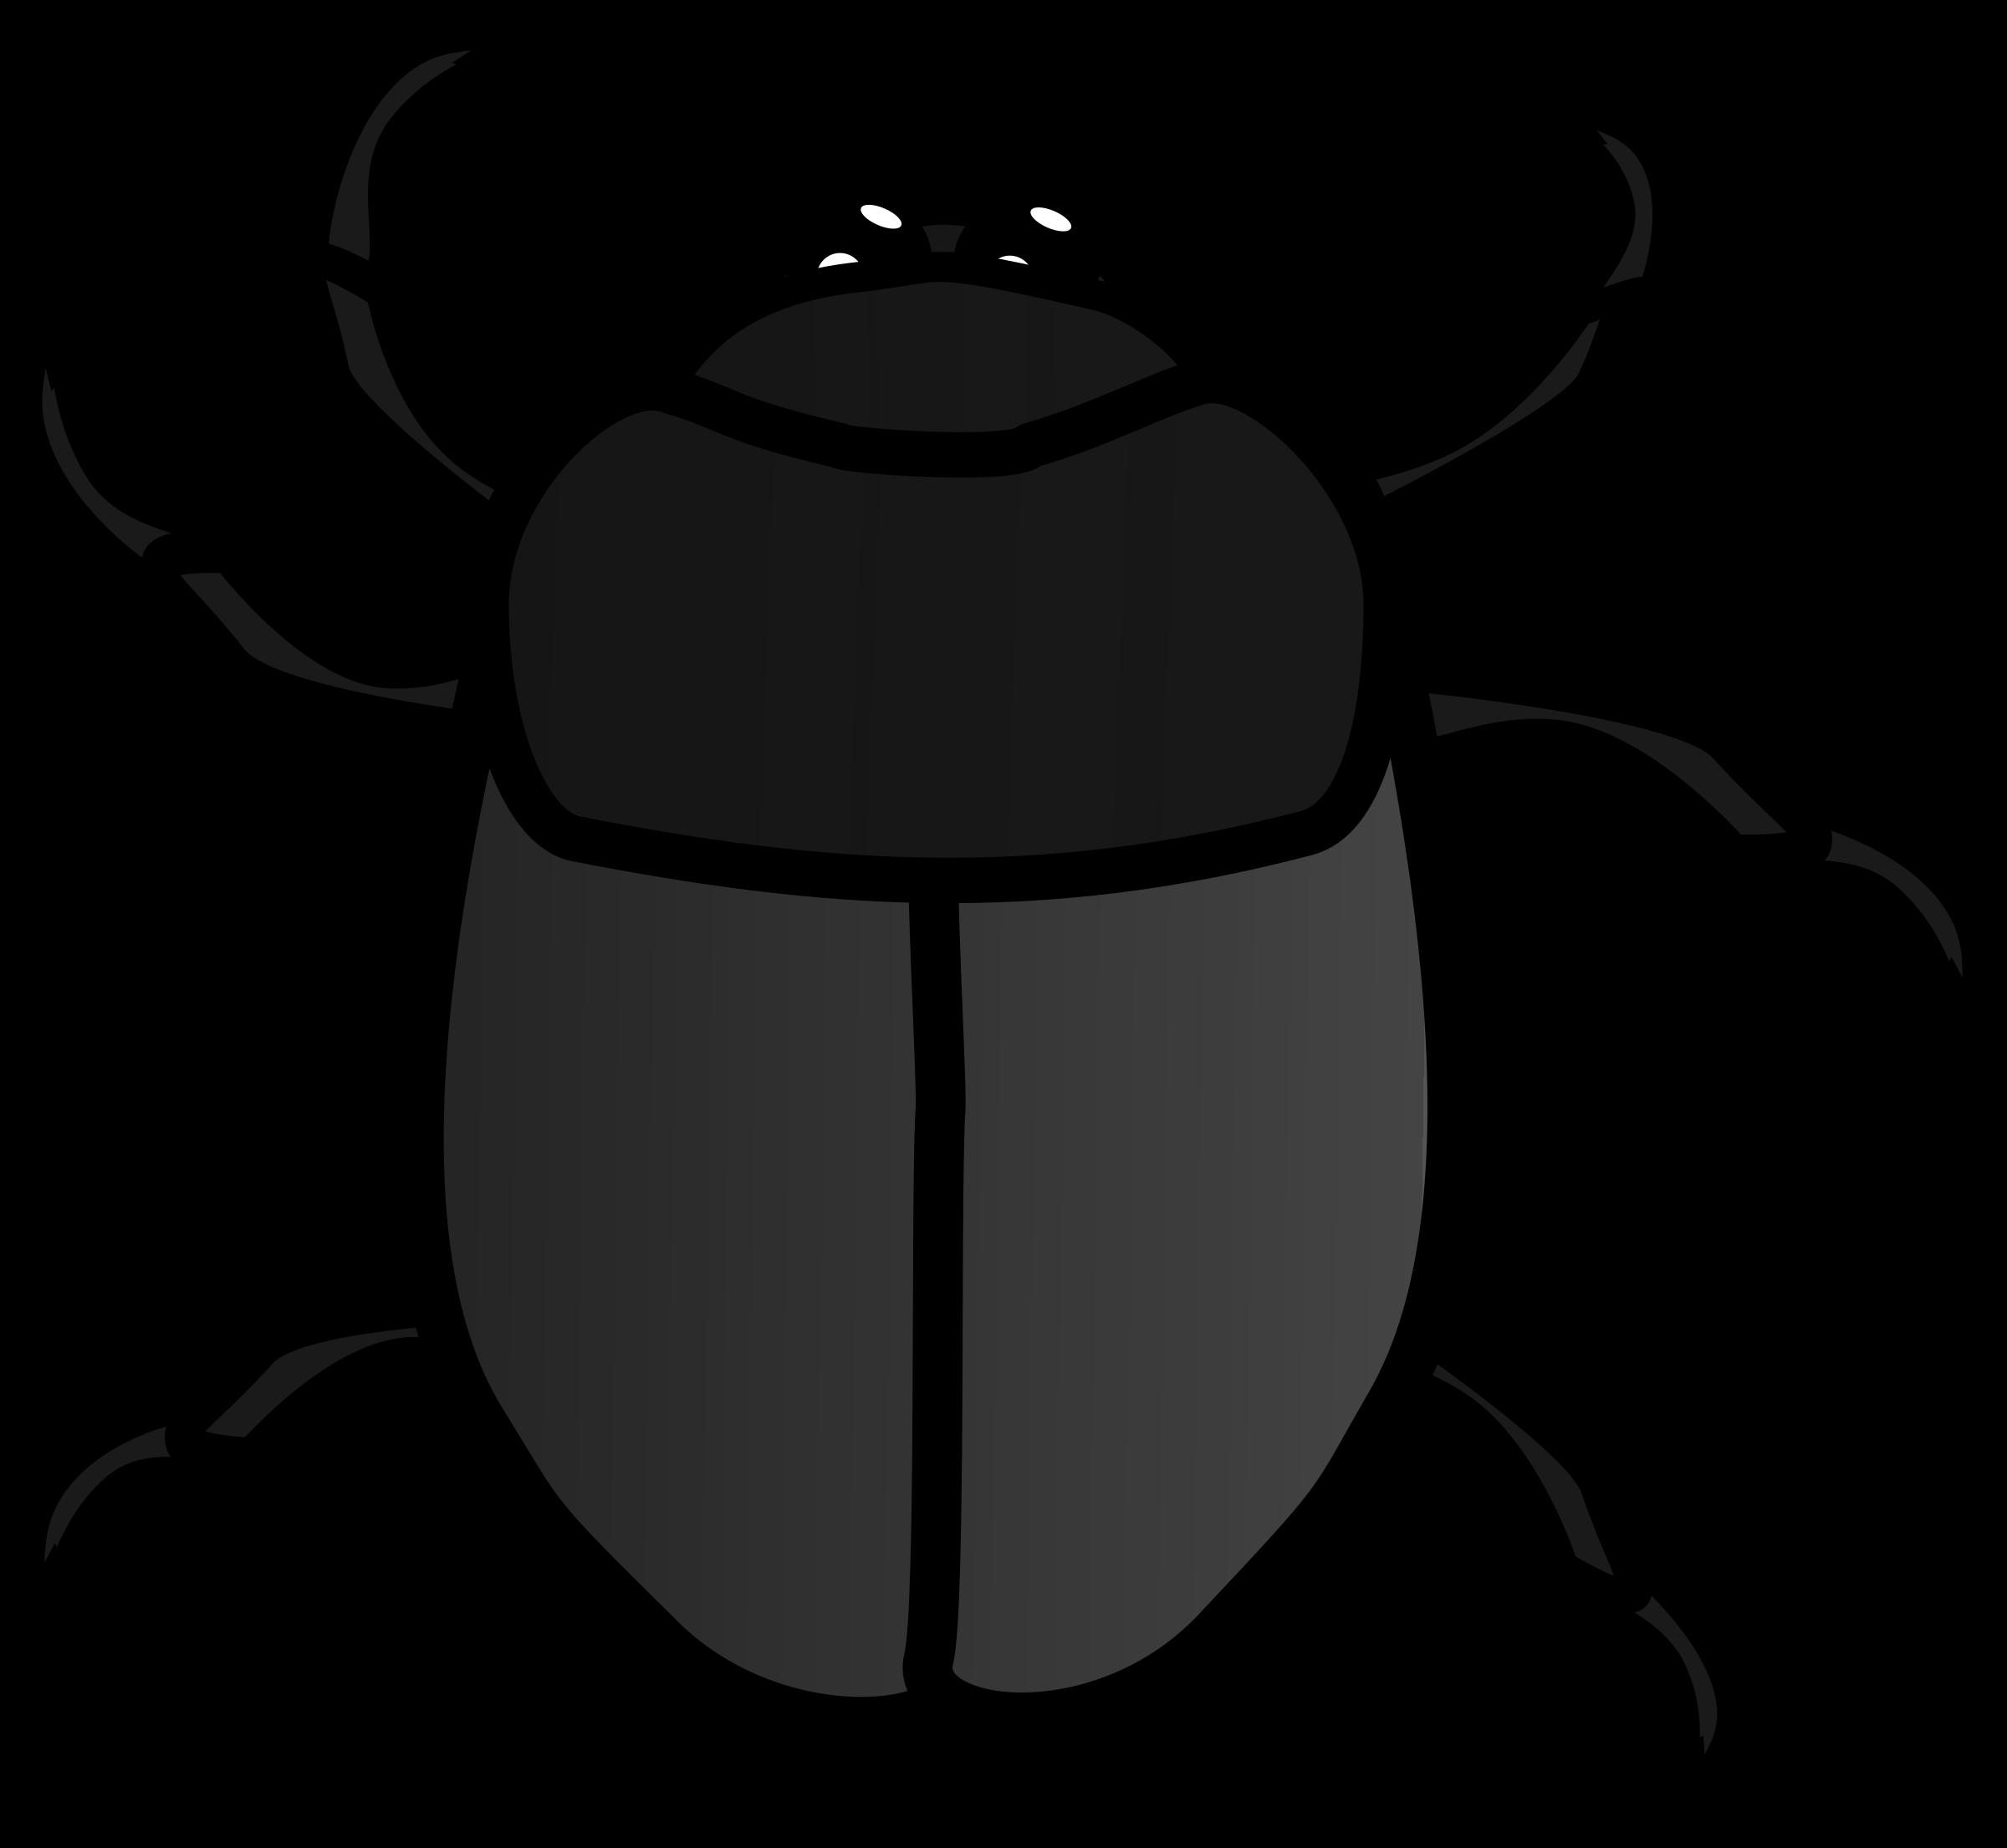 Black bug clipart jpg black and white library 84+ Bug Clipart   ClipartLook jpg black and white library